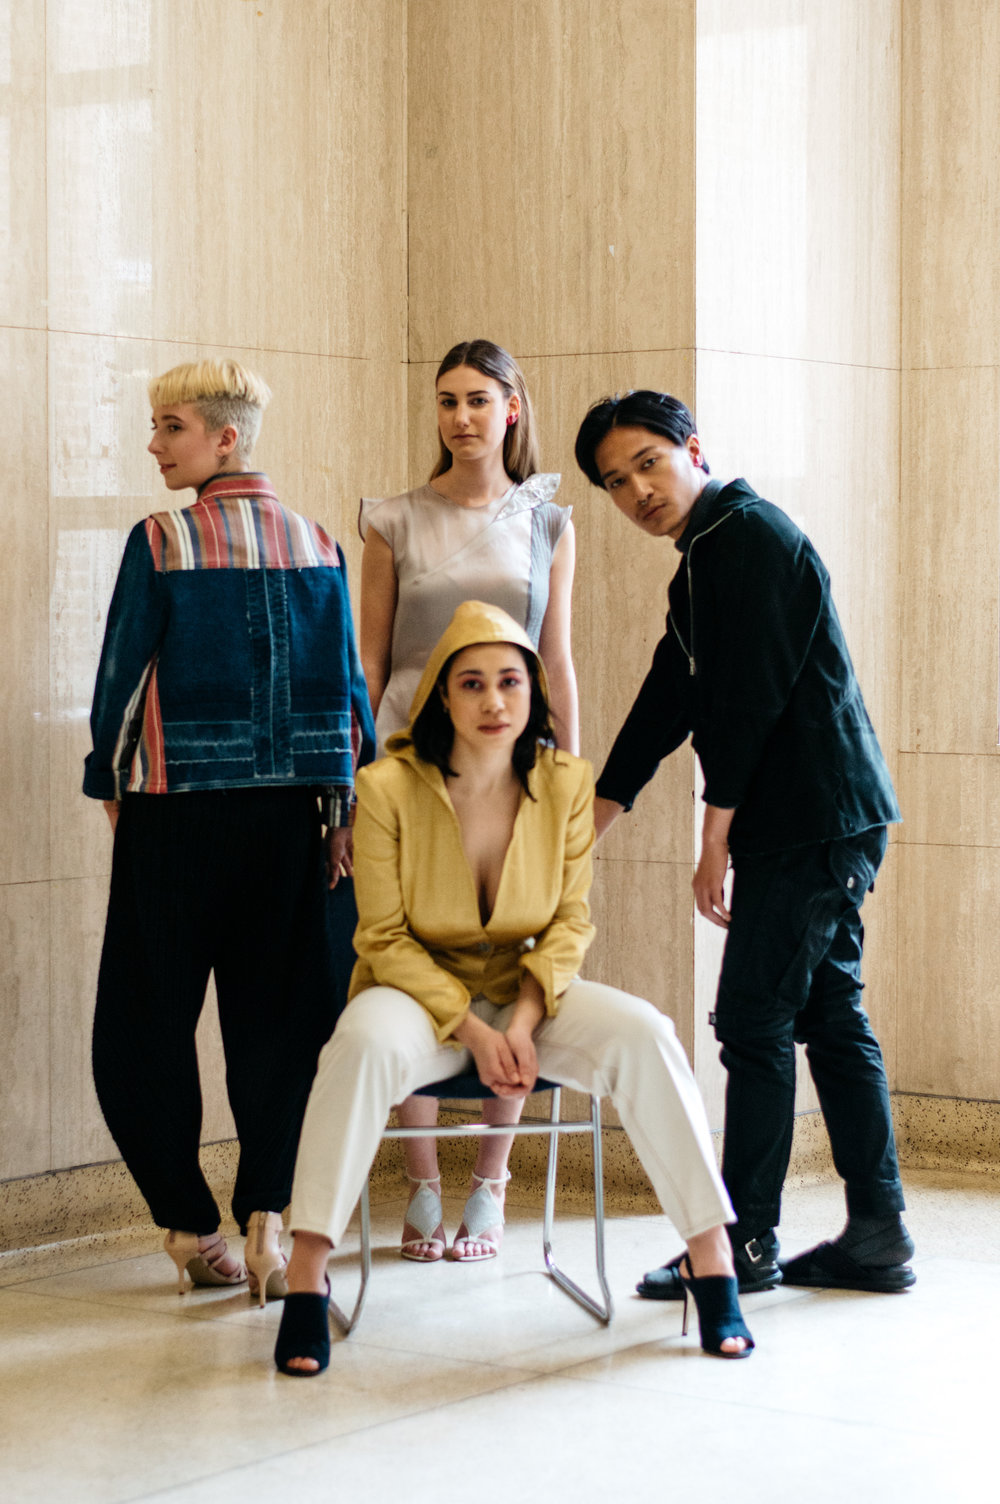 Caitlyn wears the Winnie dress. (a collaboration with @bronwyn_seier), Madeleine wears the Rhoda blazer. Zandrew wears the Daisy jacket, and Abi models the Denim Deconstruction jacket.